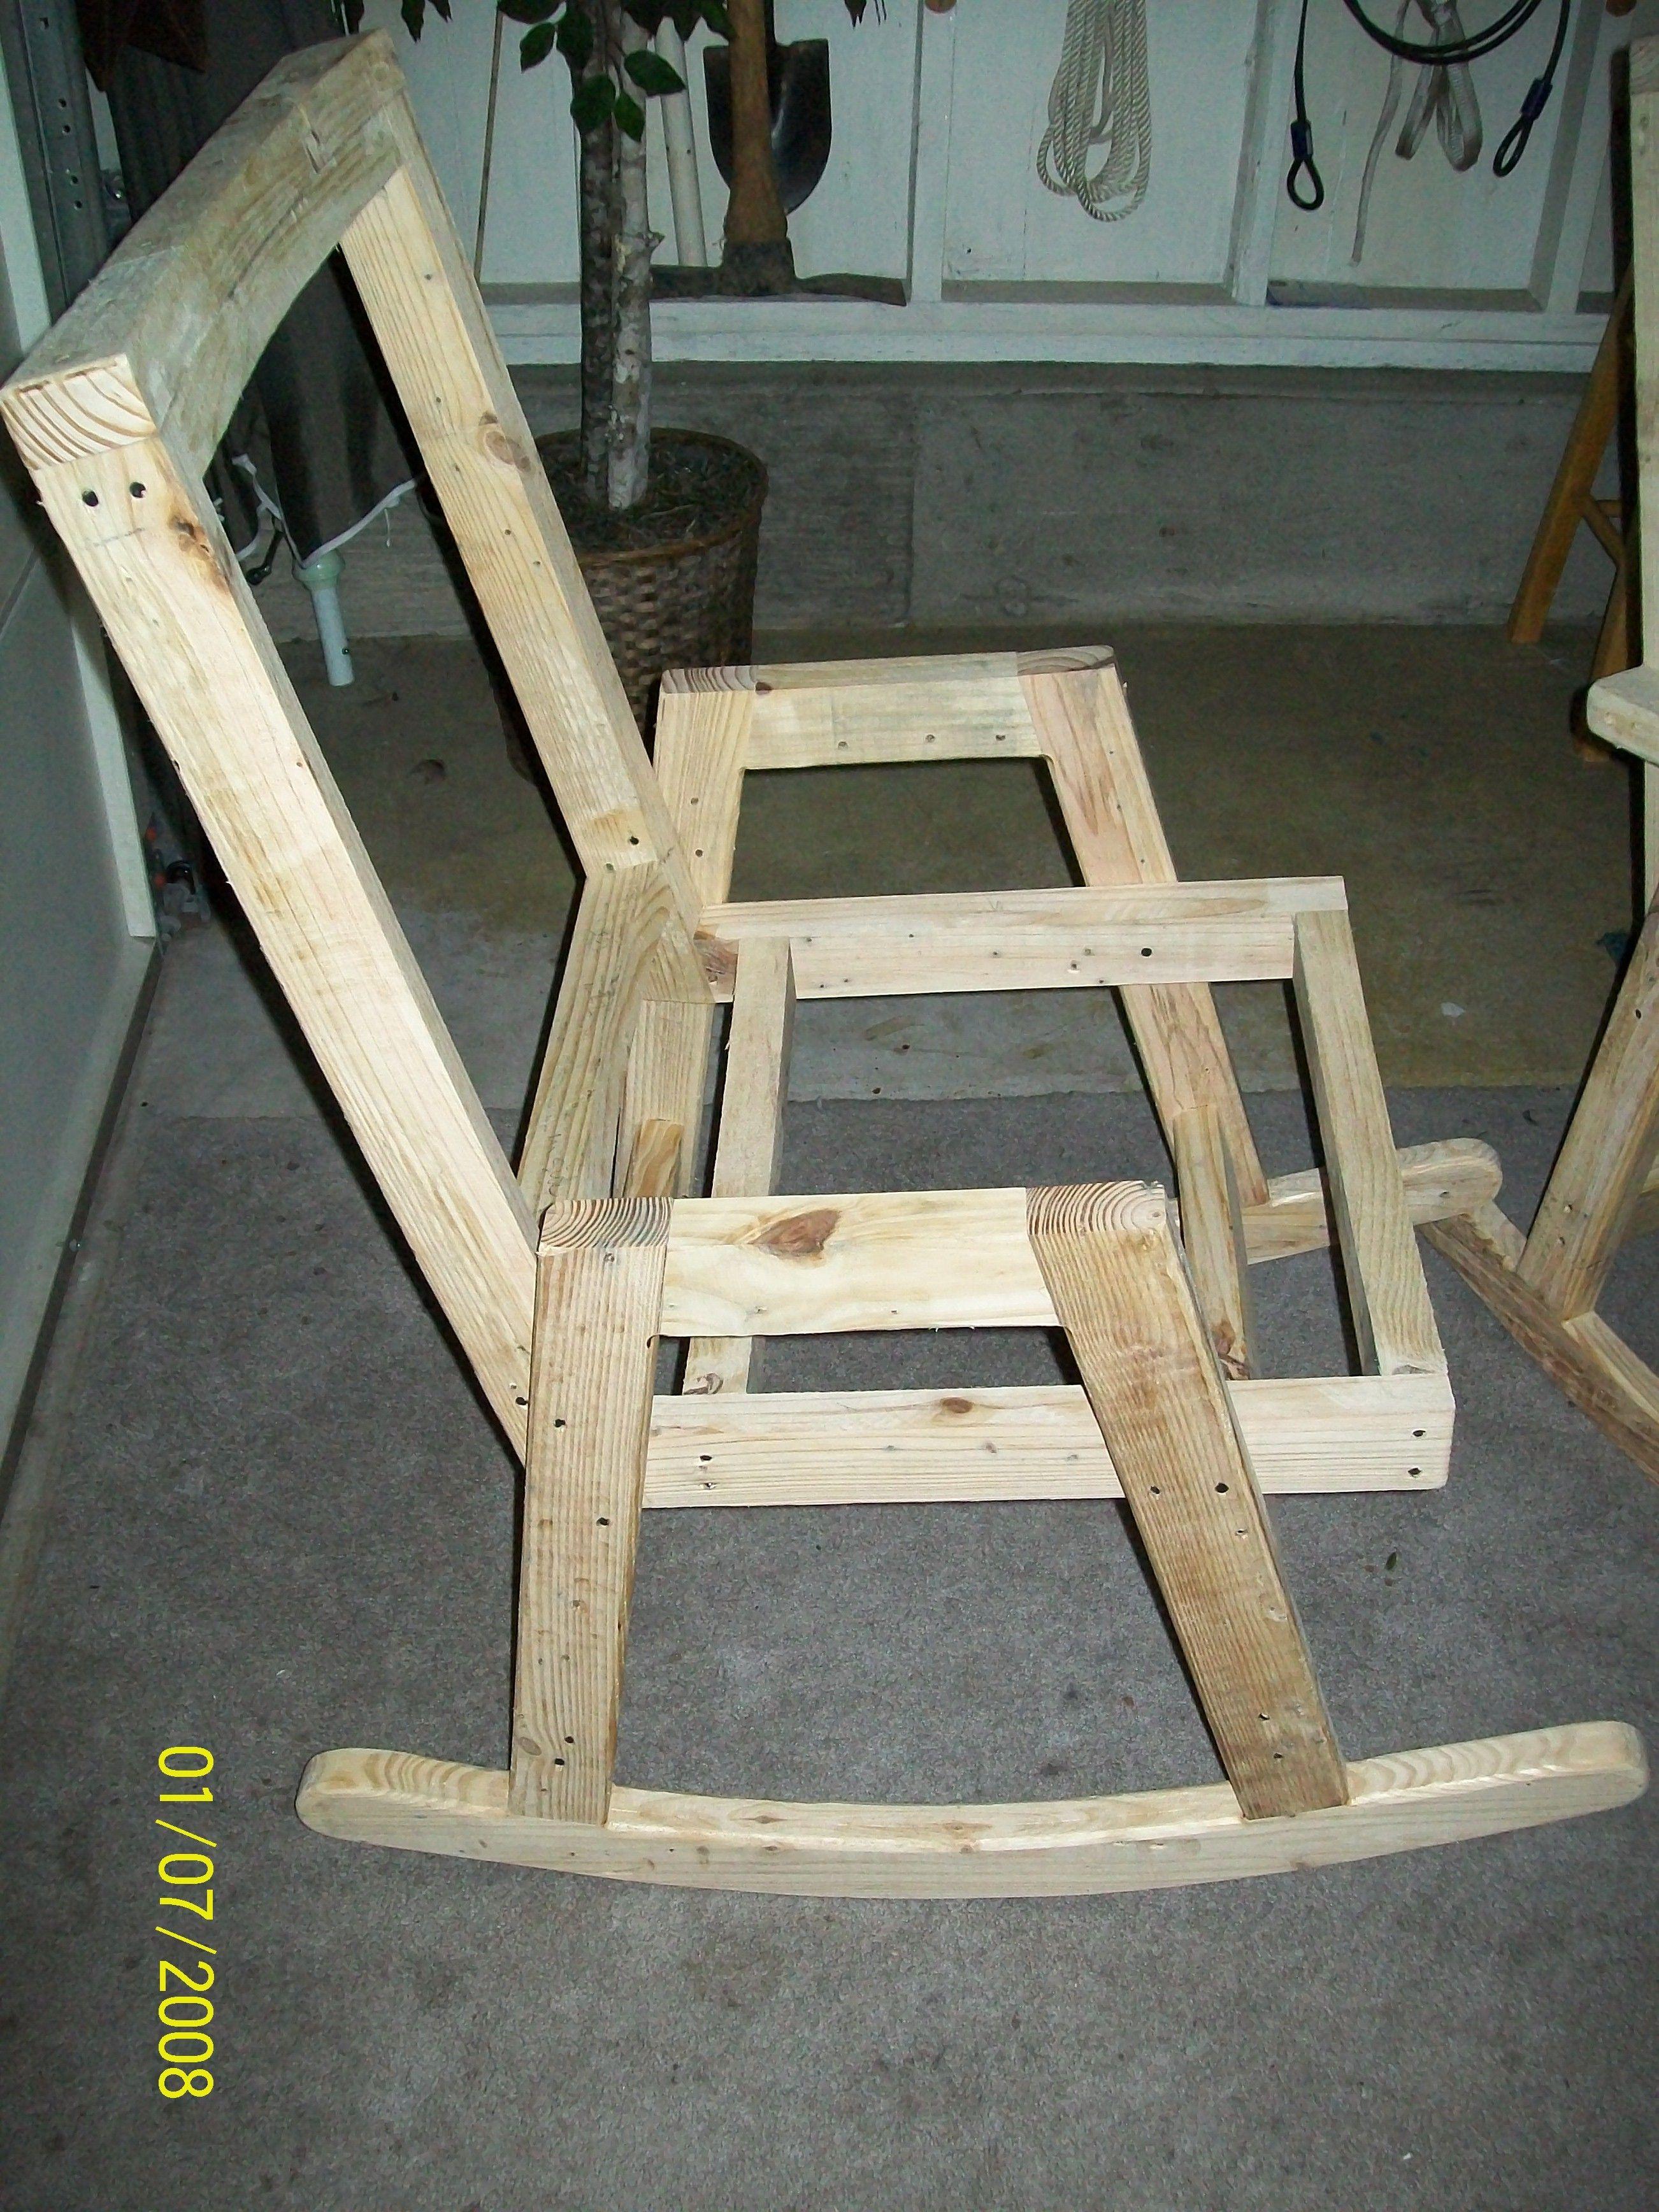 Diy Pallet Rocking Chair Plans Indoor Hammock Ikea 2nd Frame Rockers In 2019 Furniture